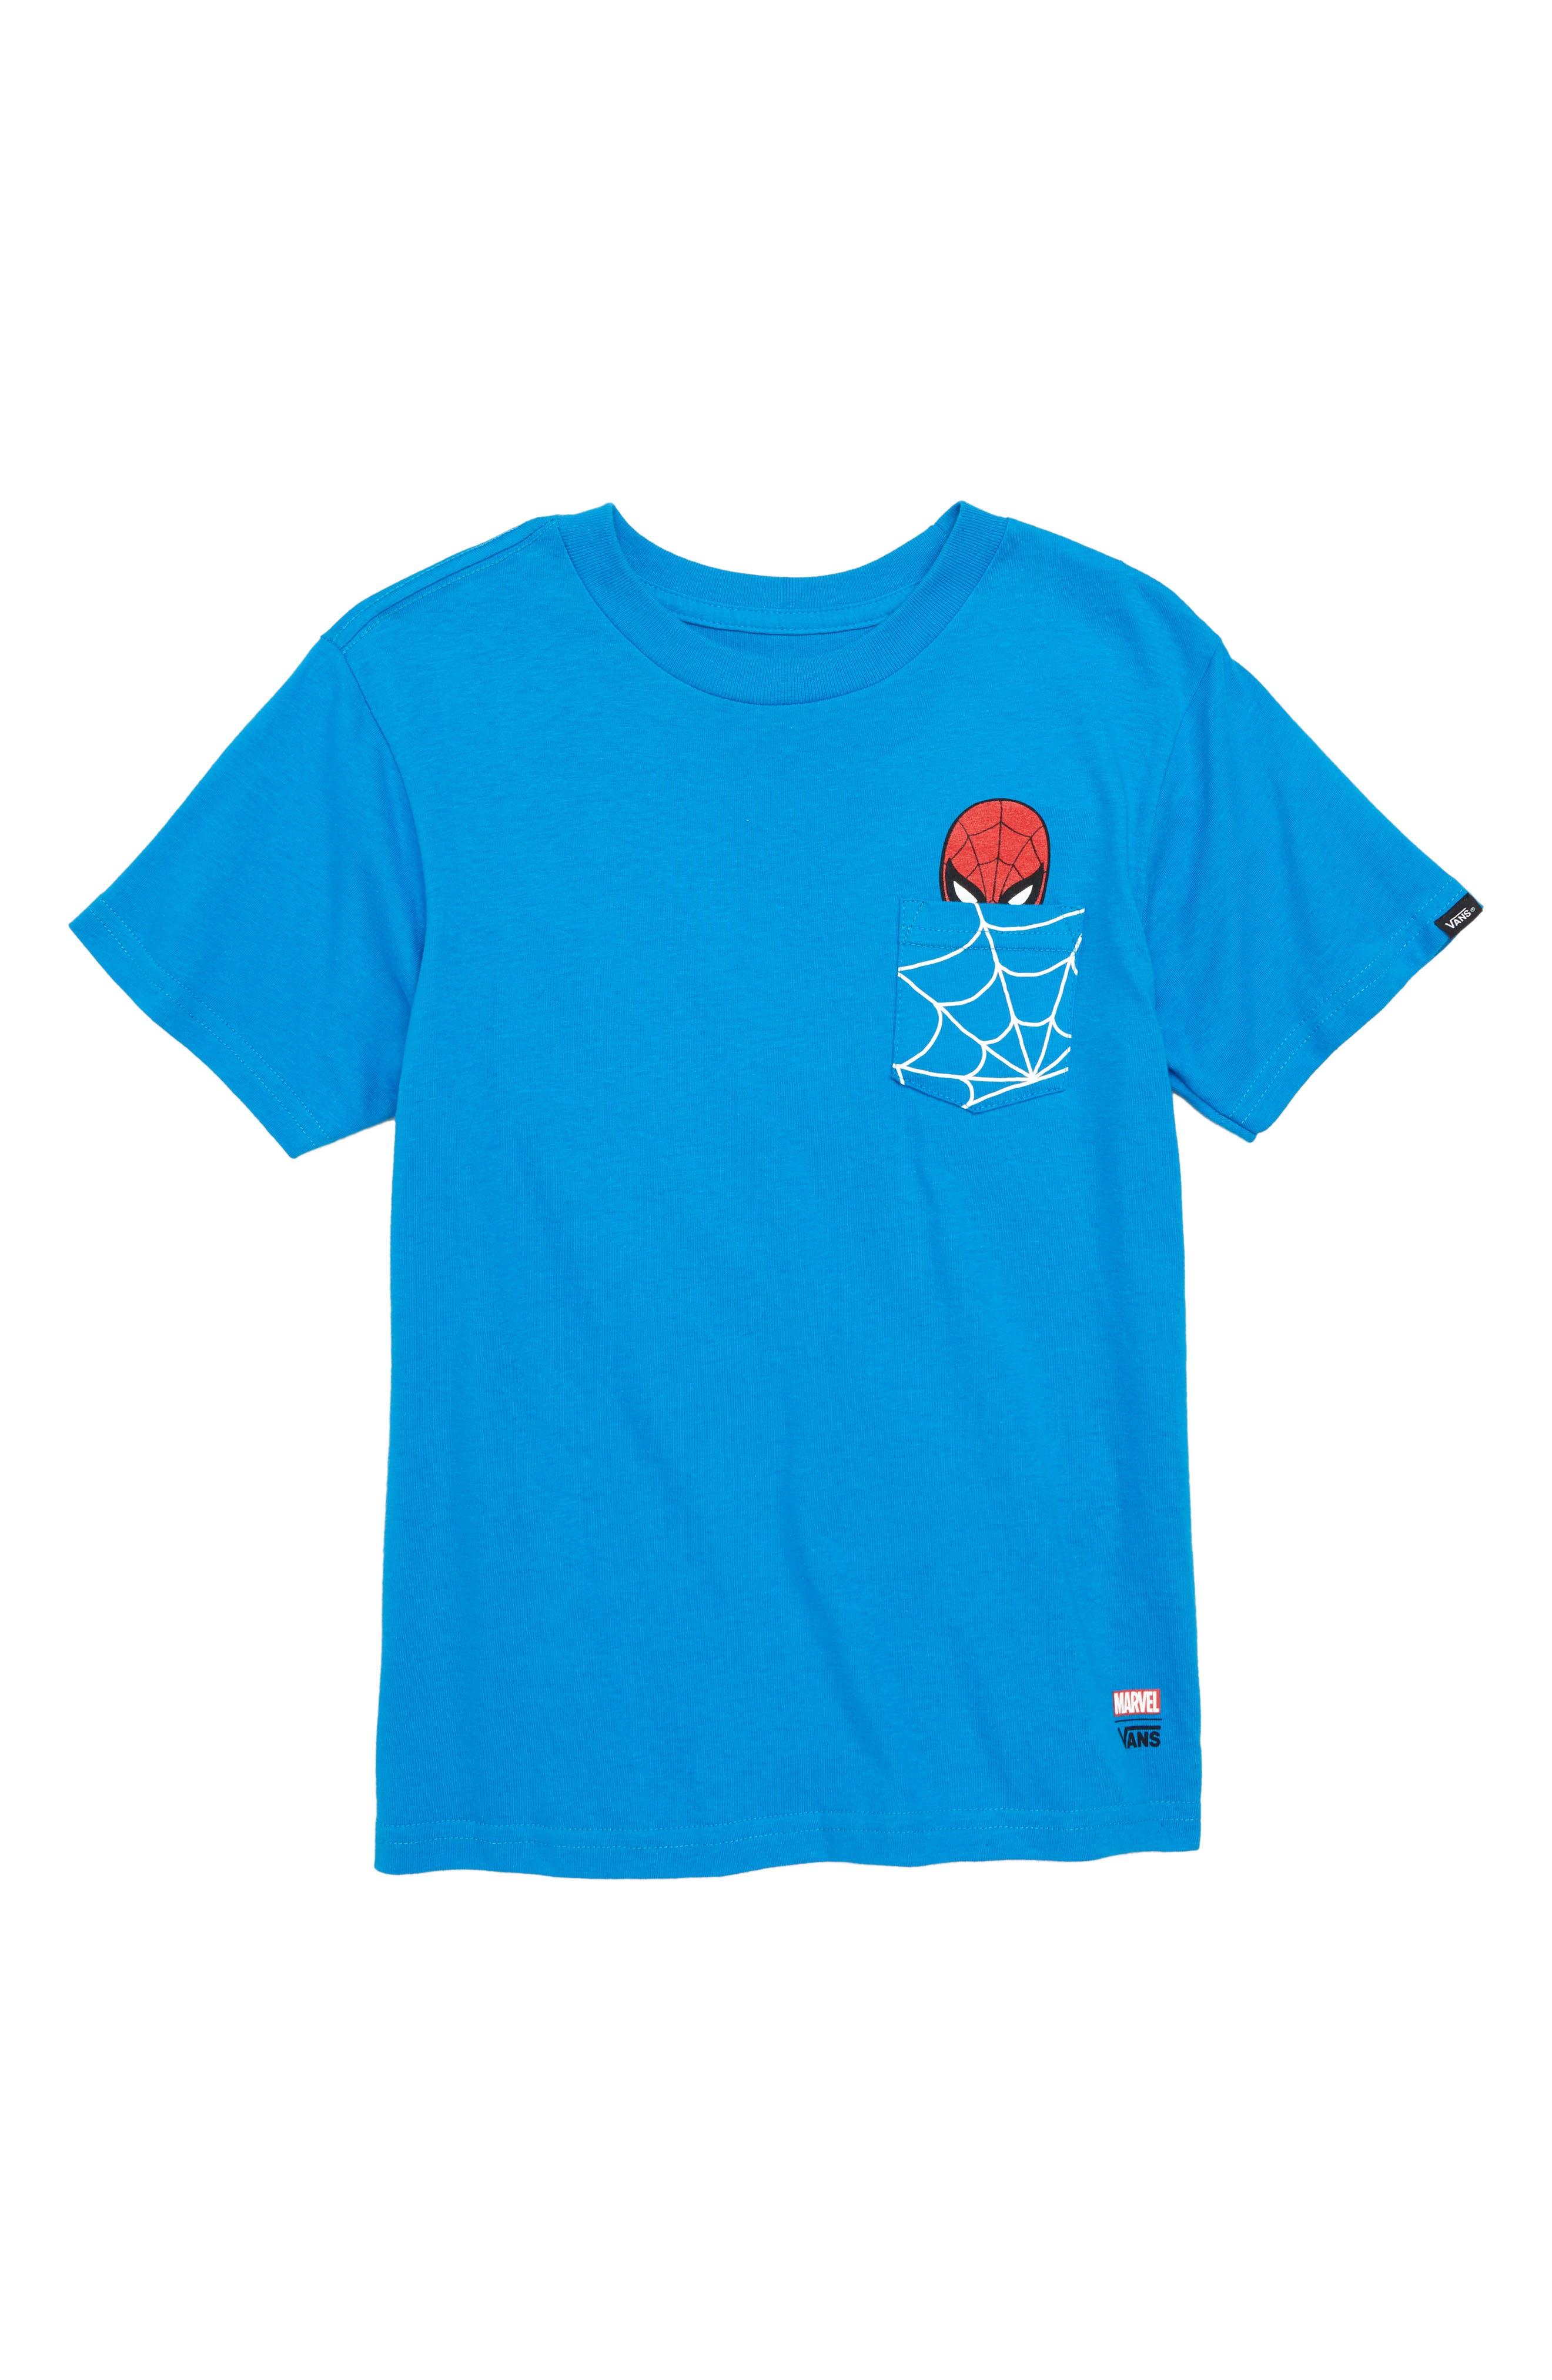 VANS x Marvel<sup>®</sup> Avengers Spider-Man<sup>™</sup> Pocket T-Shirt, Main, color, 420